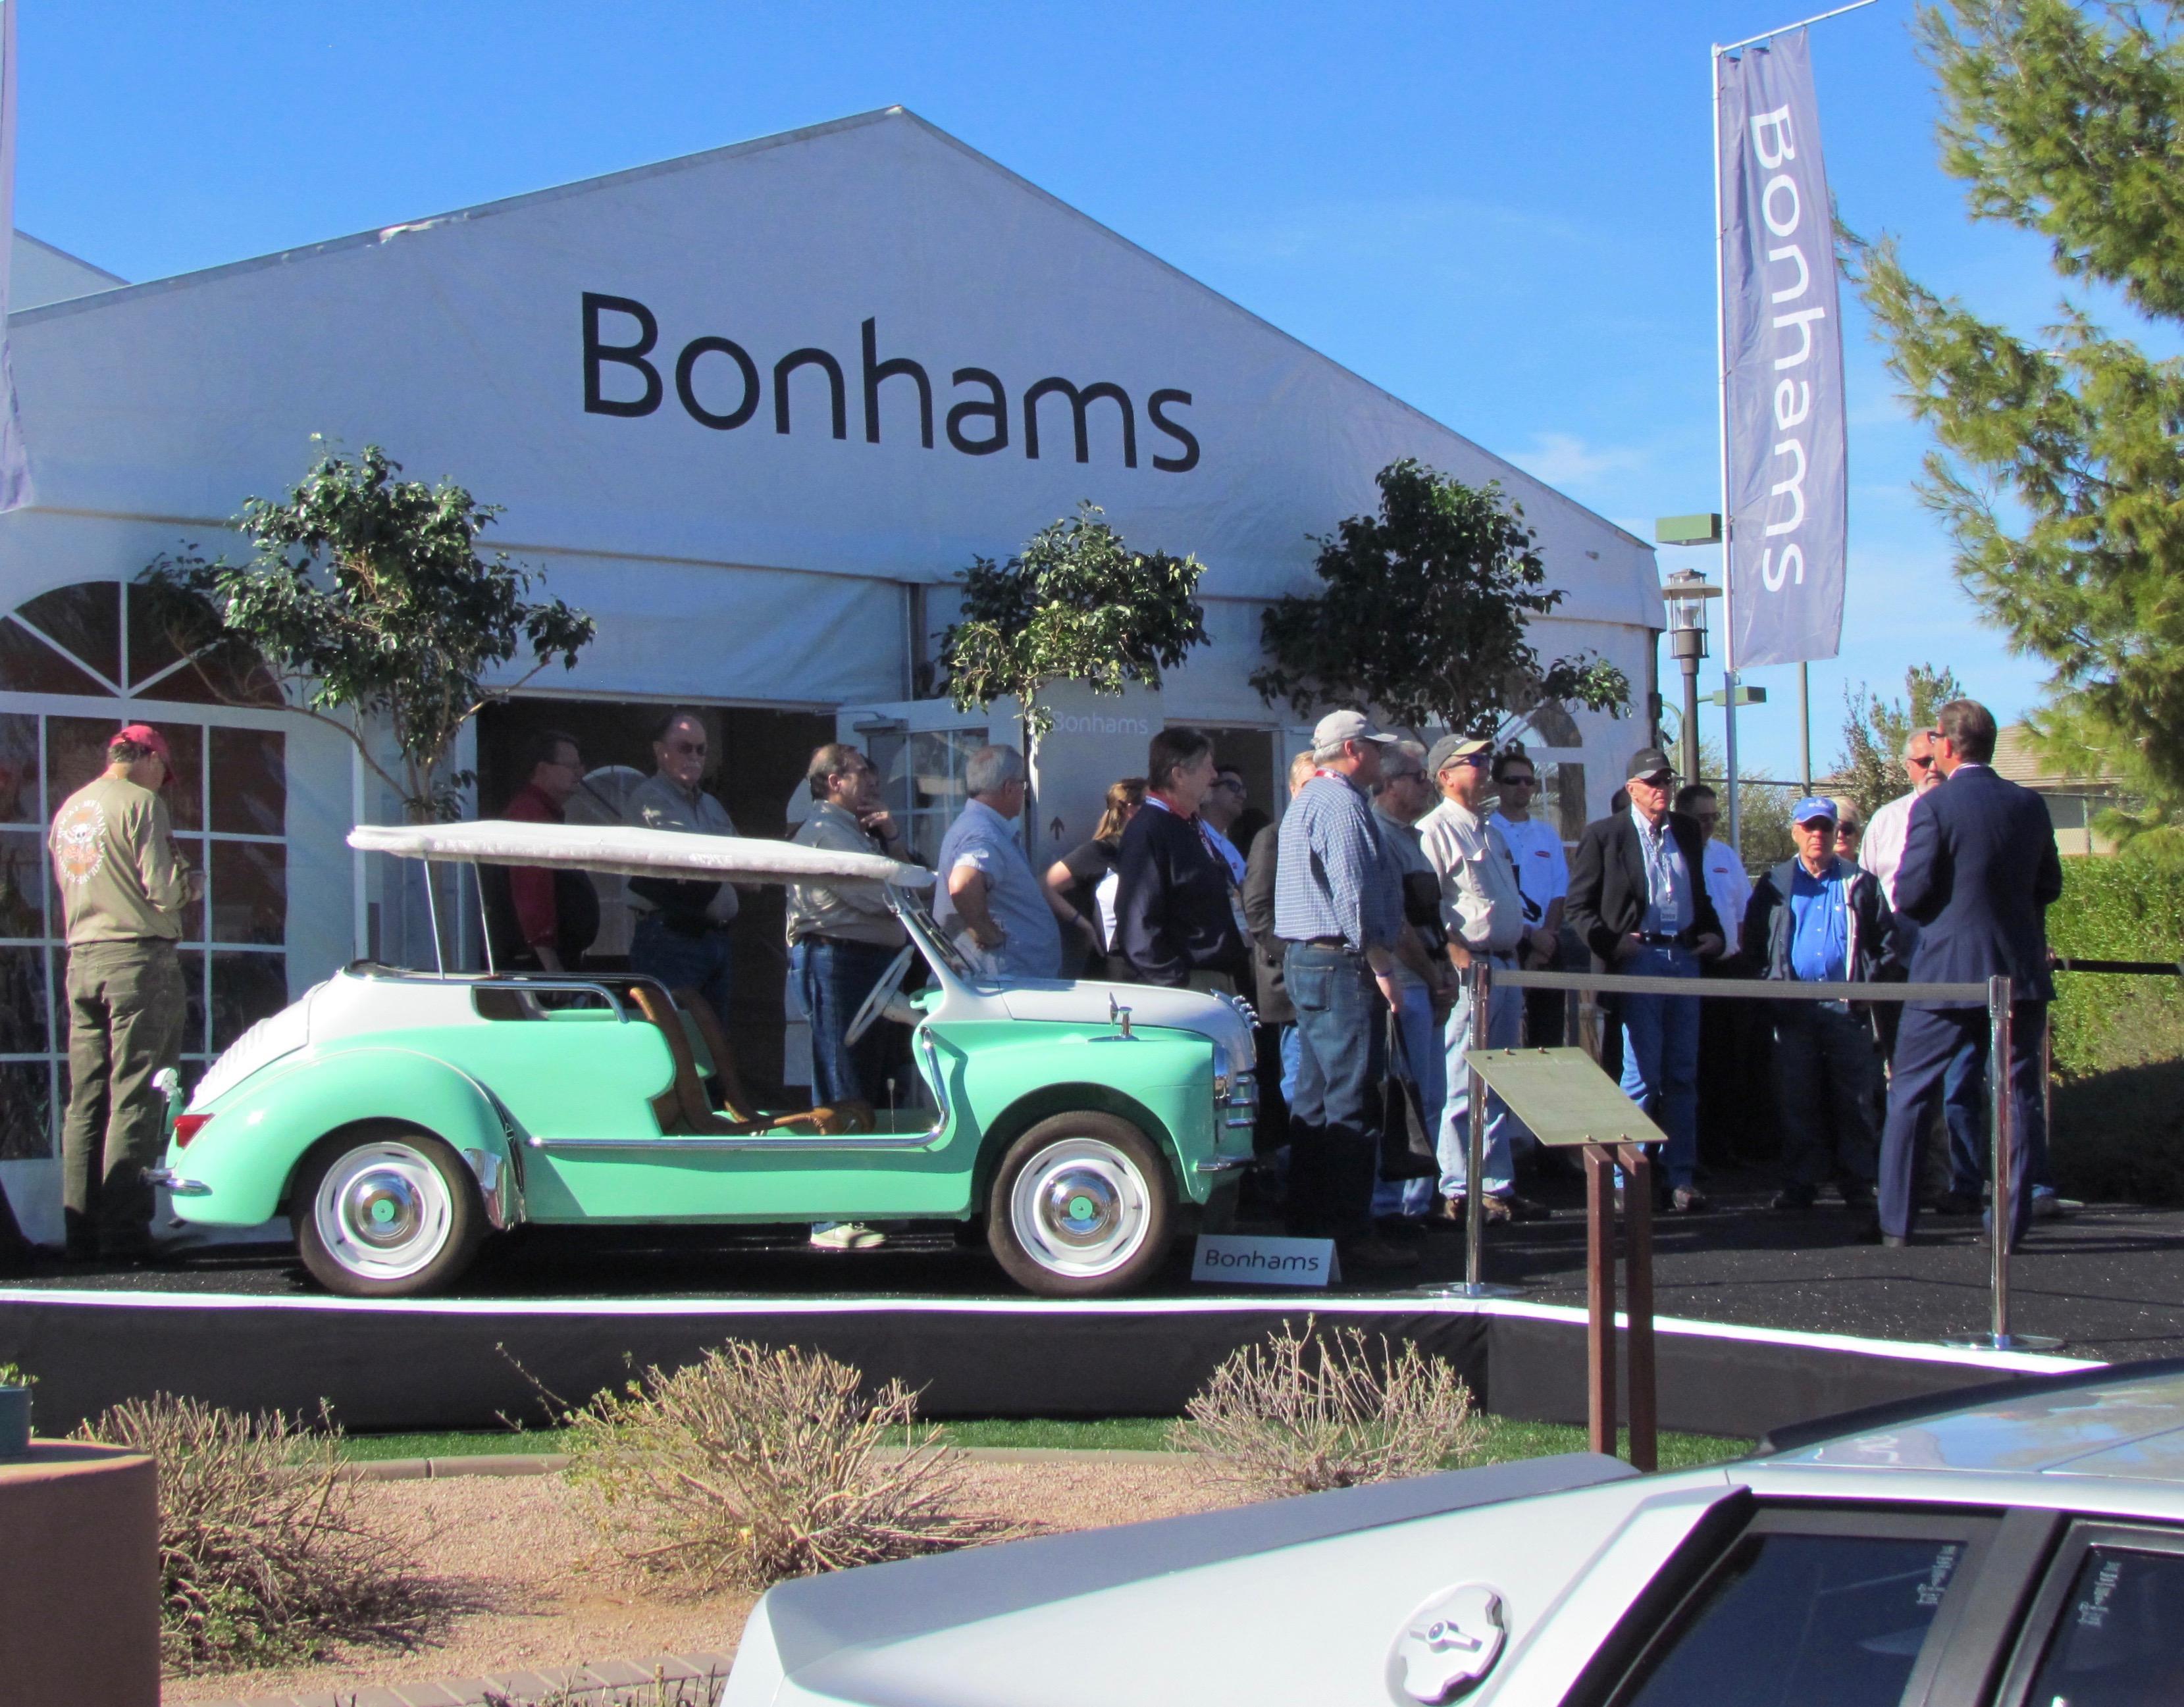 Andy Reid (right) meets a tour group outside the Bonhams tent | Classic Car News photo